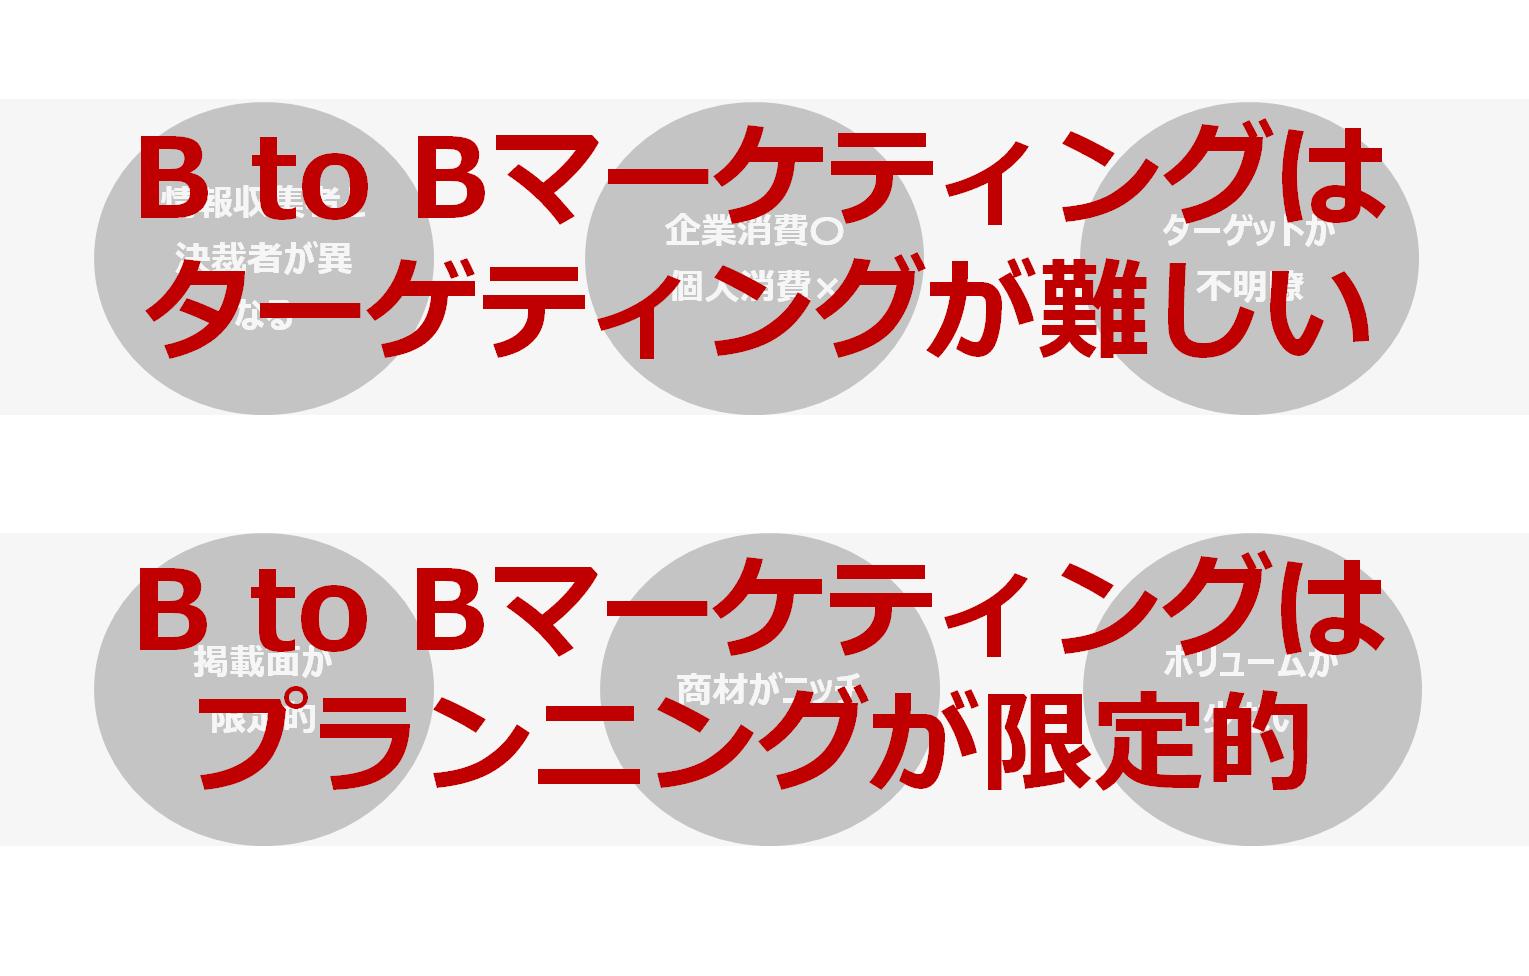 B to Bマーケティングの現状 2